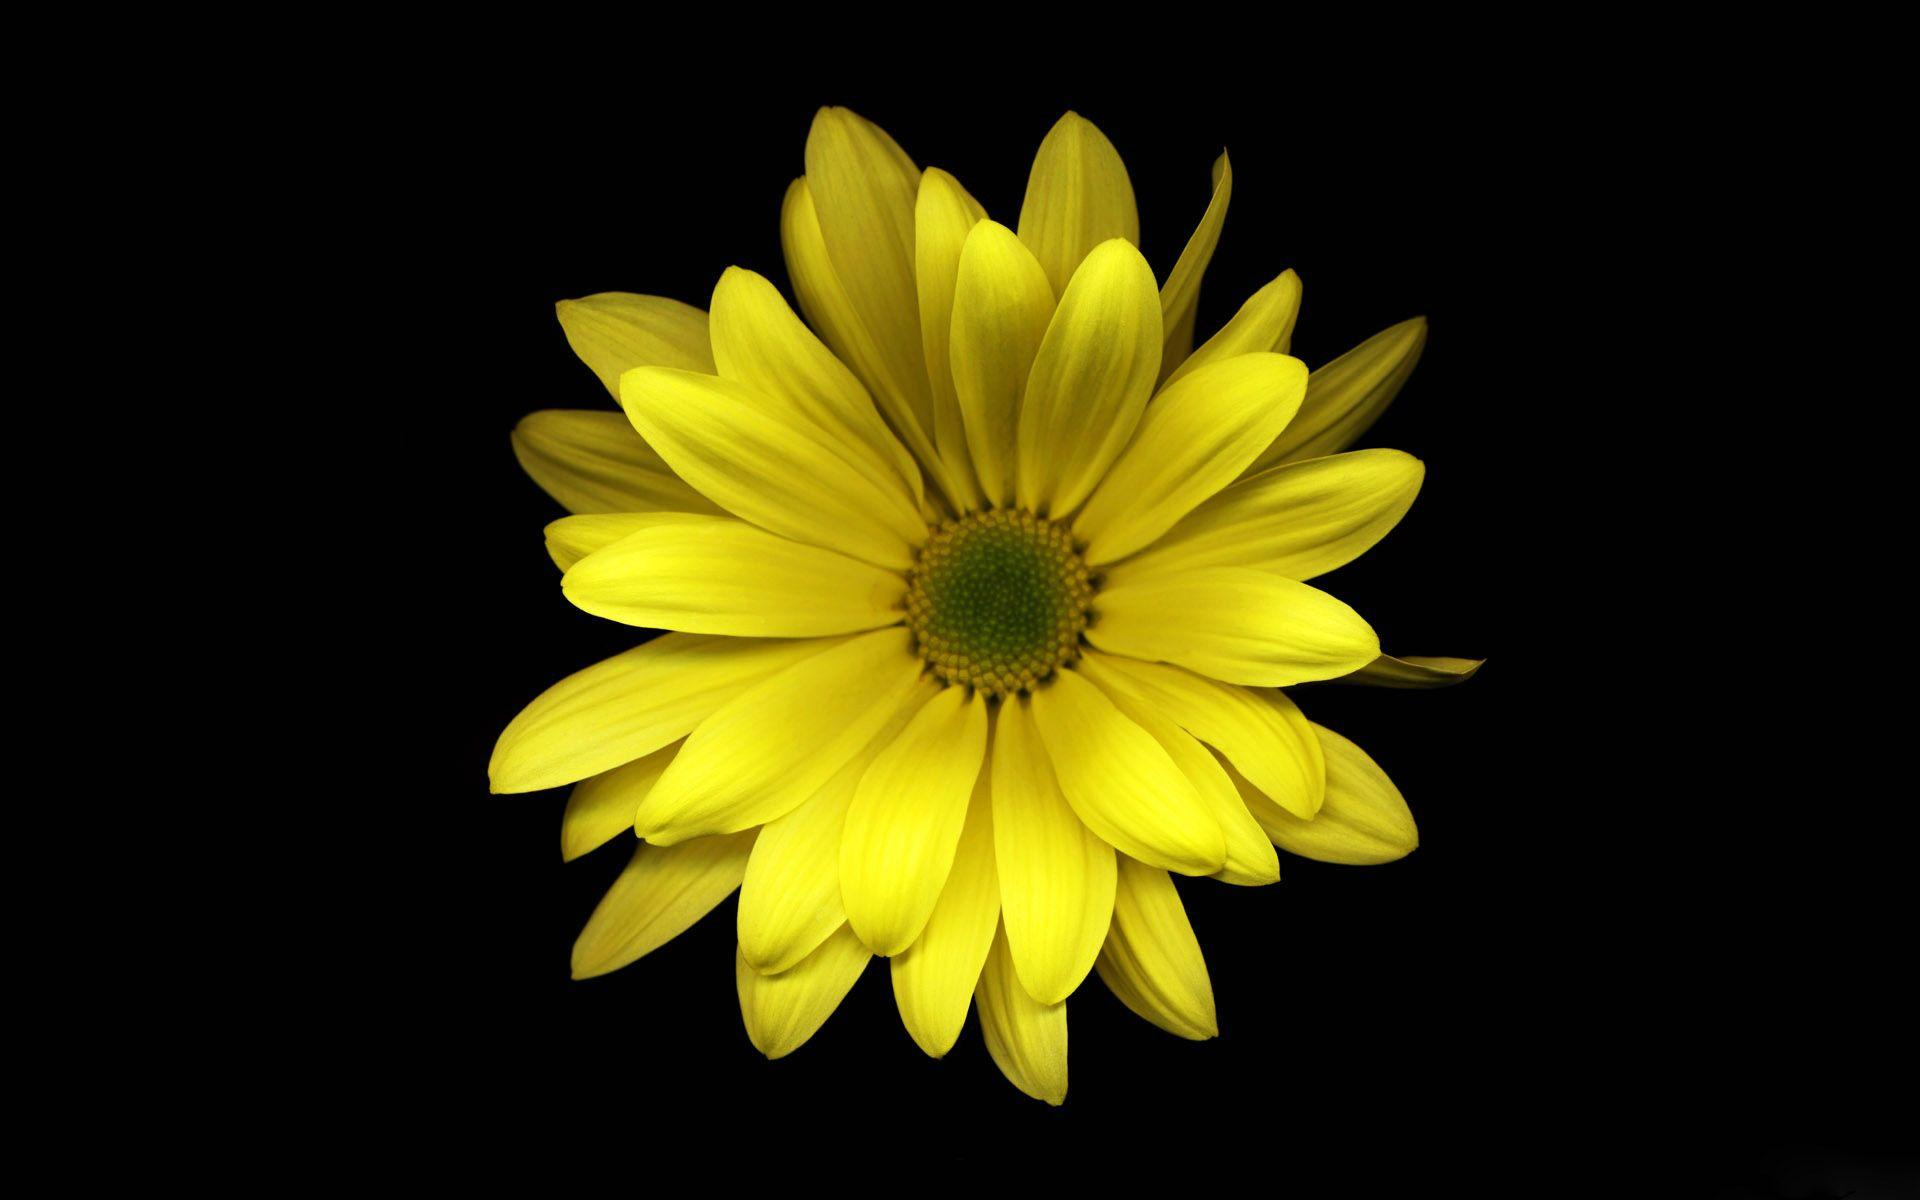 Free Desktop Wallpapers Flowers - Wallpaper Cave Yellow Black Flowers Wallpaper